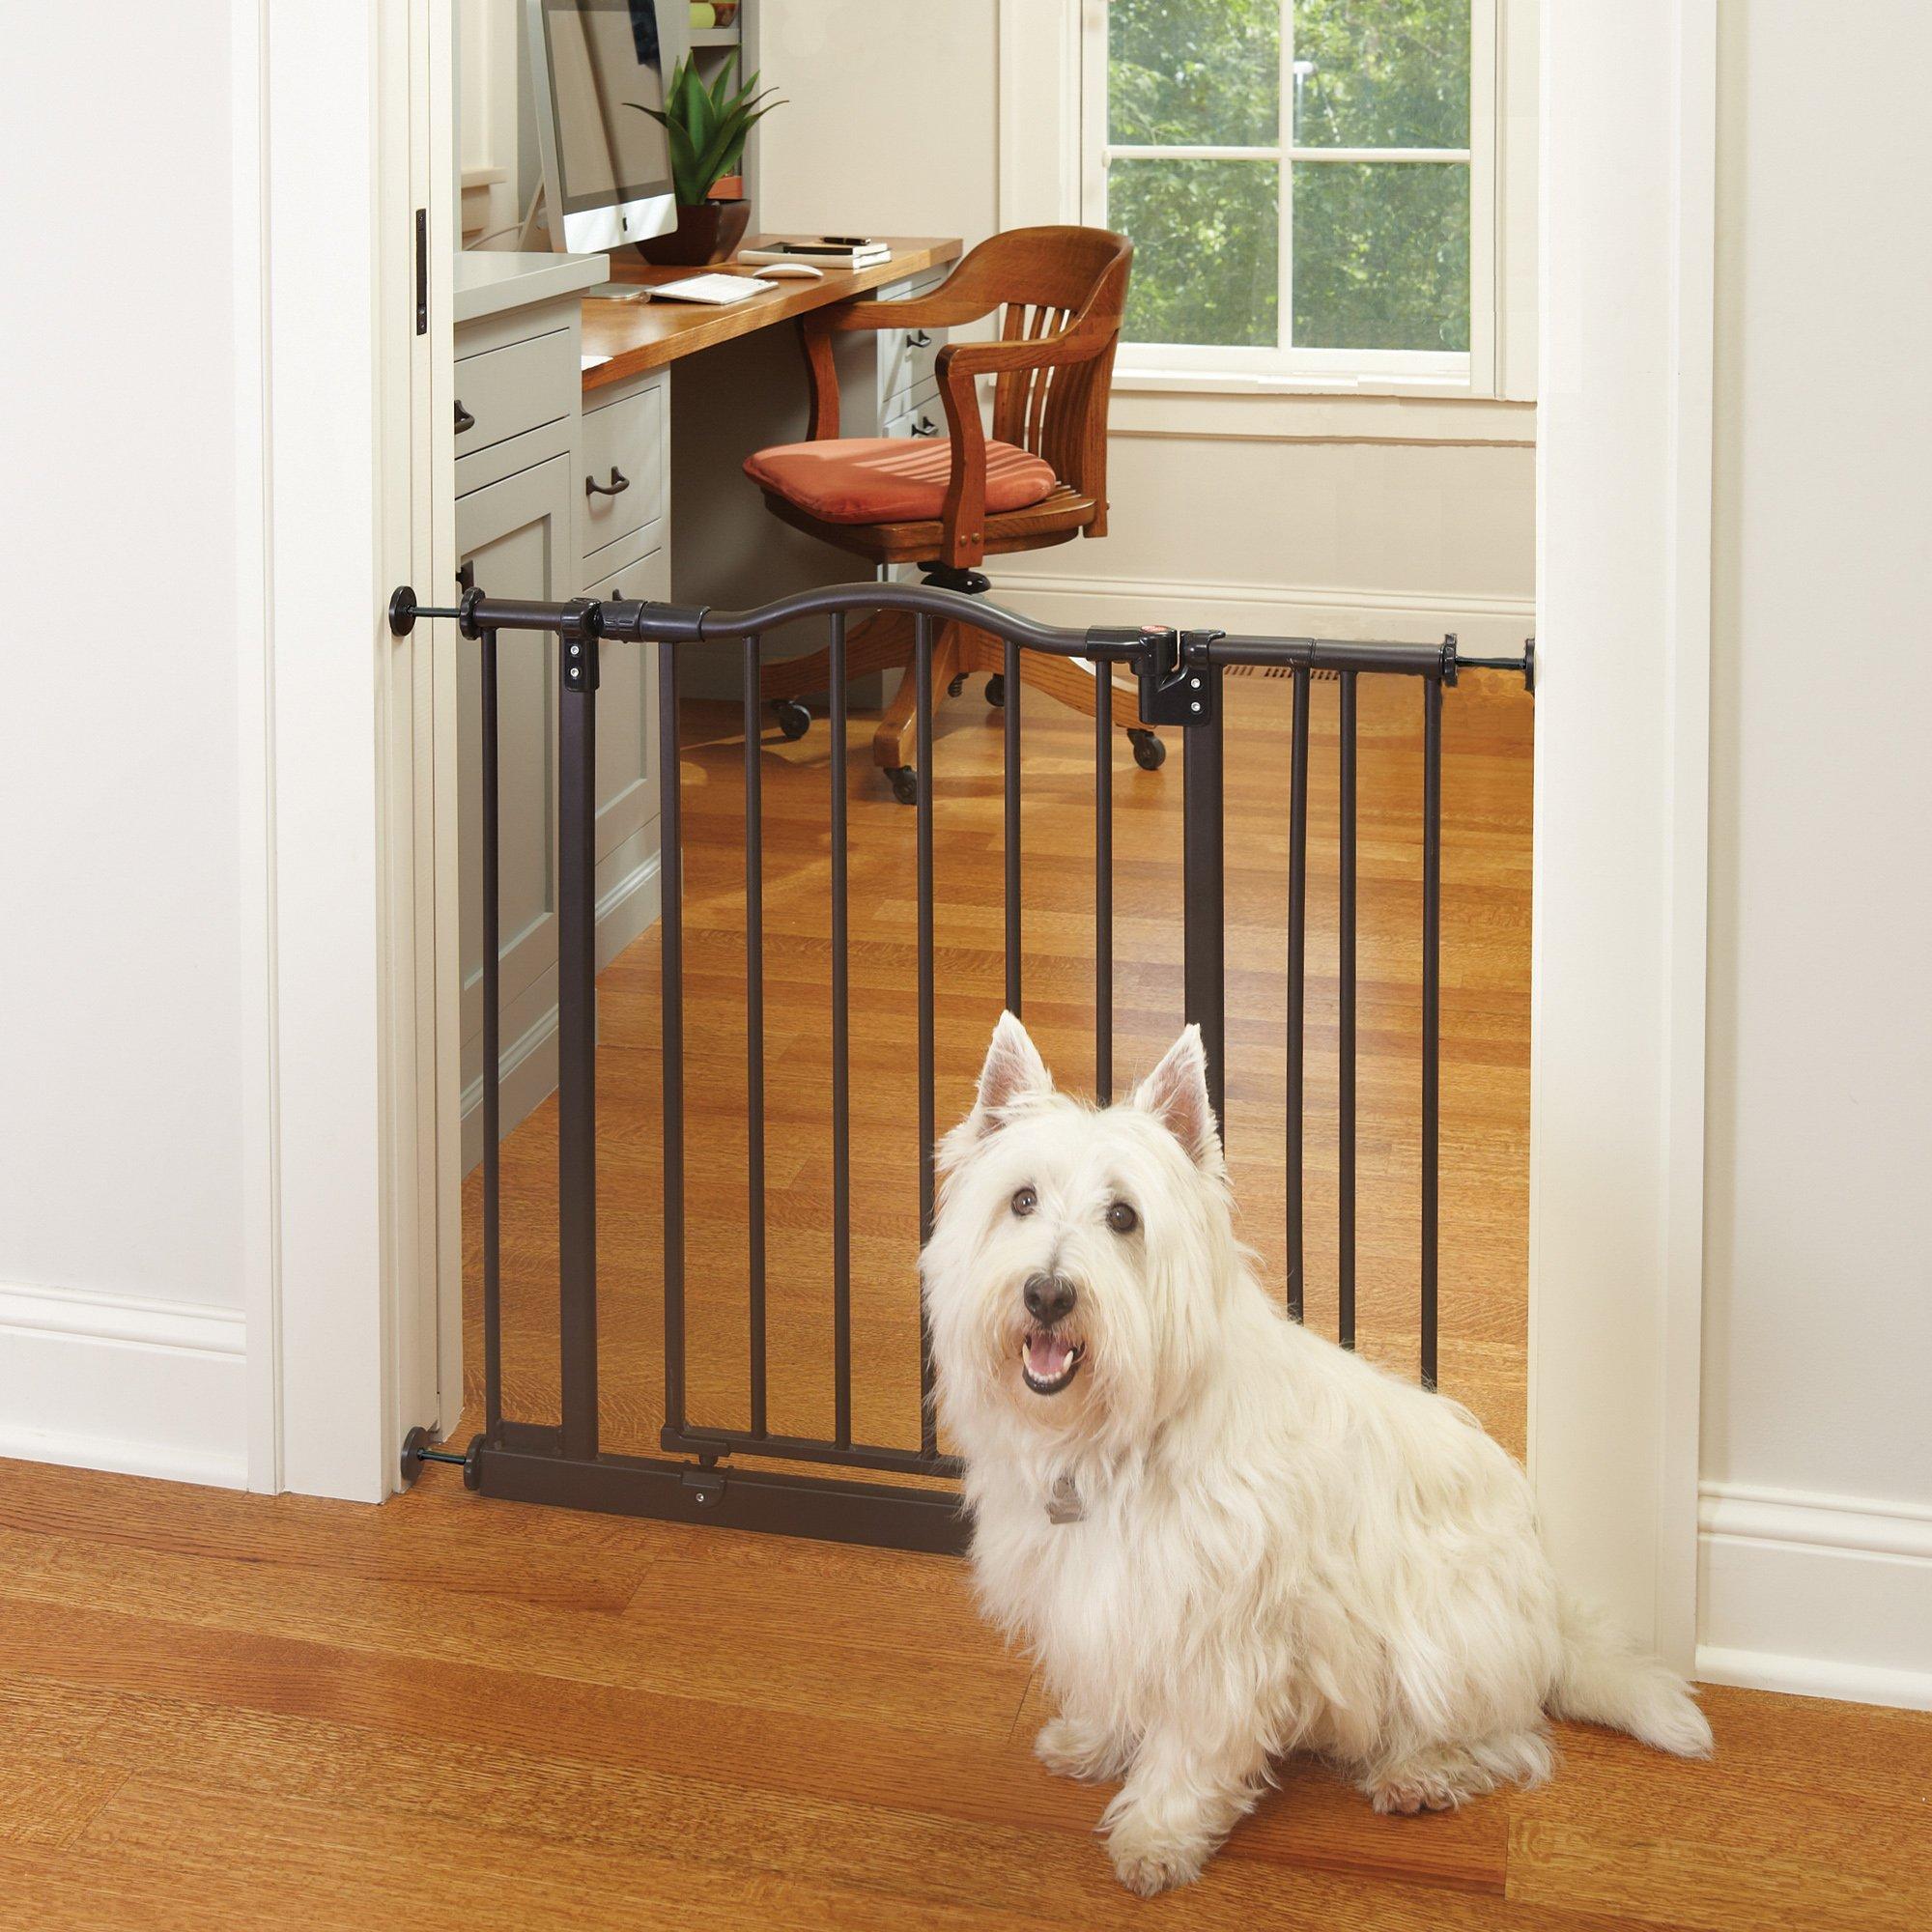 My Pet Windsor Arch Gate